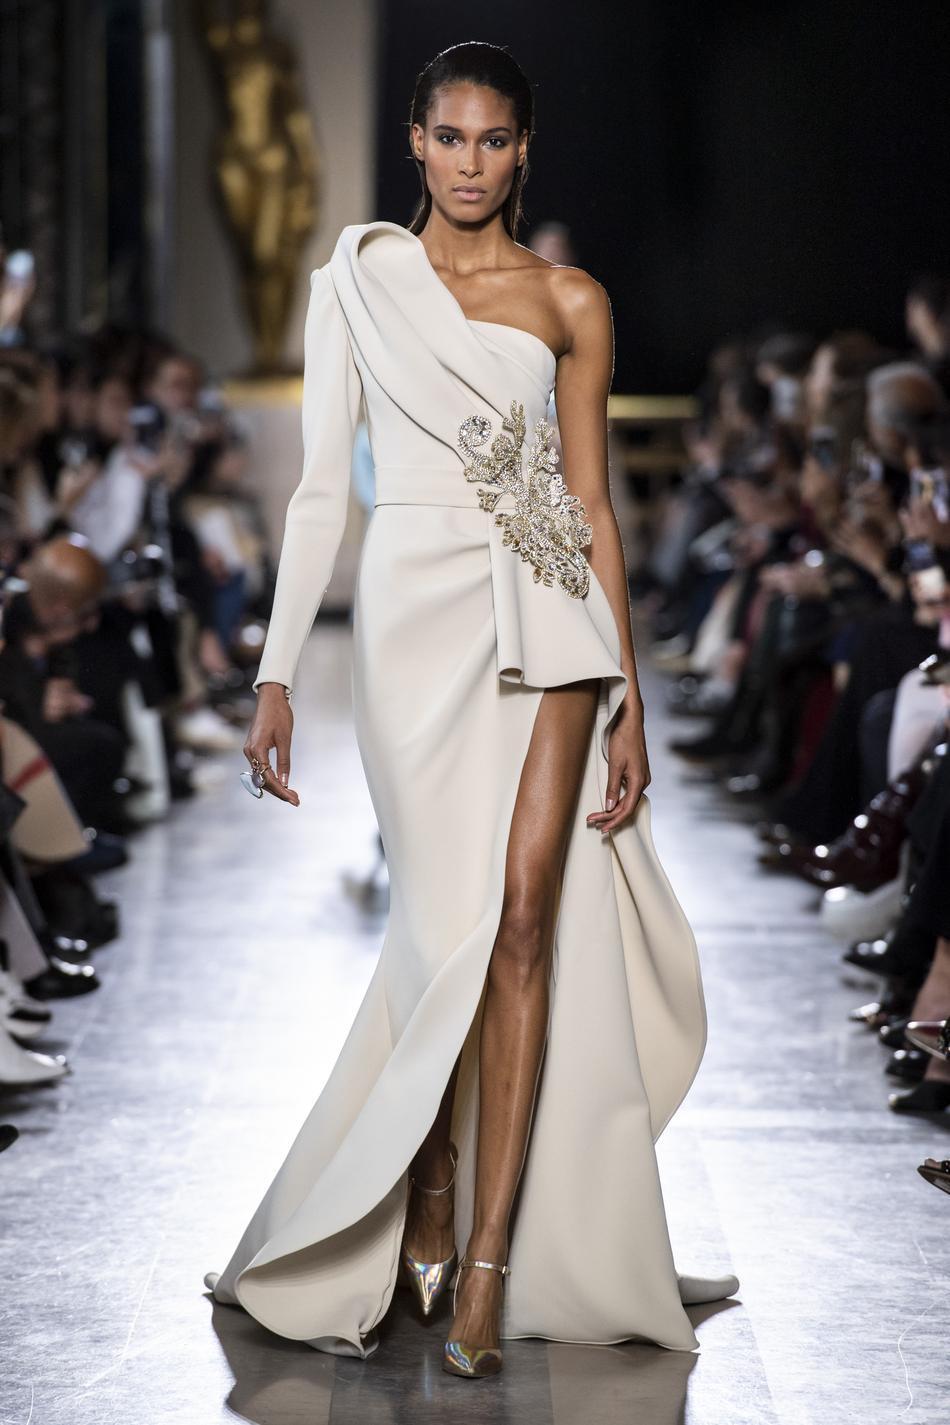 Quand les robes de haute couture inspirent